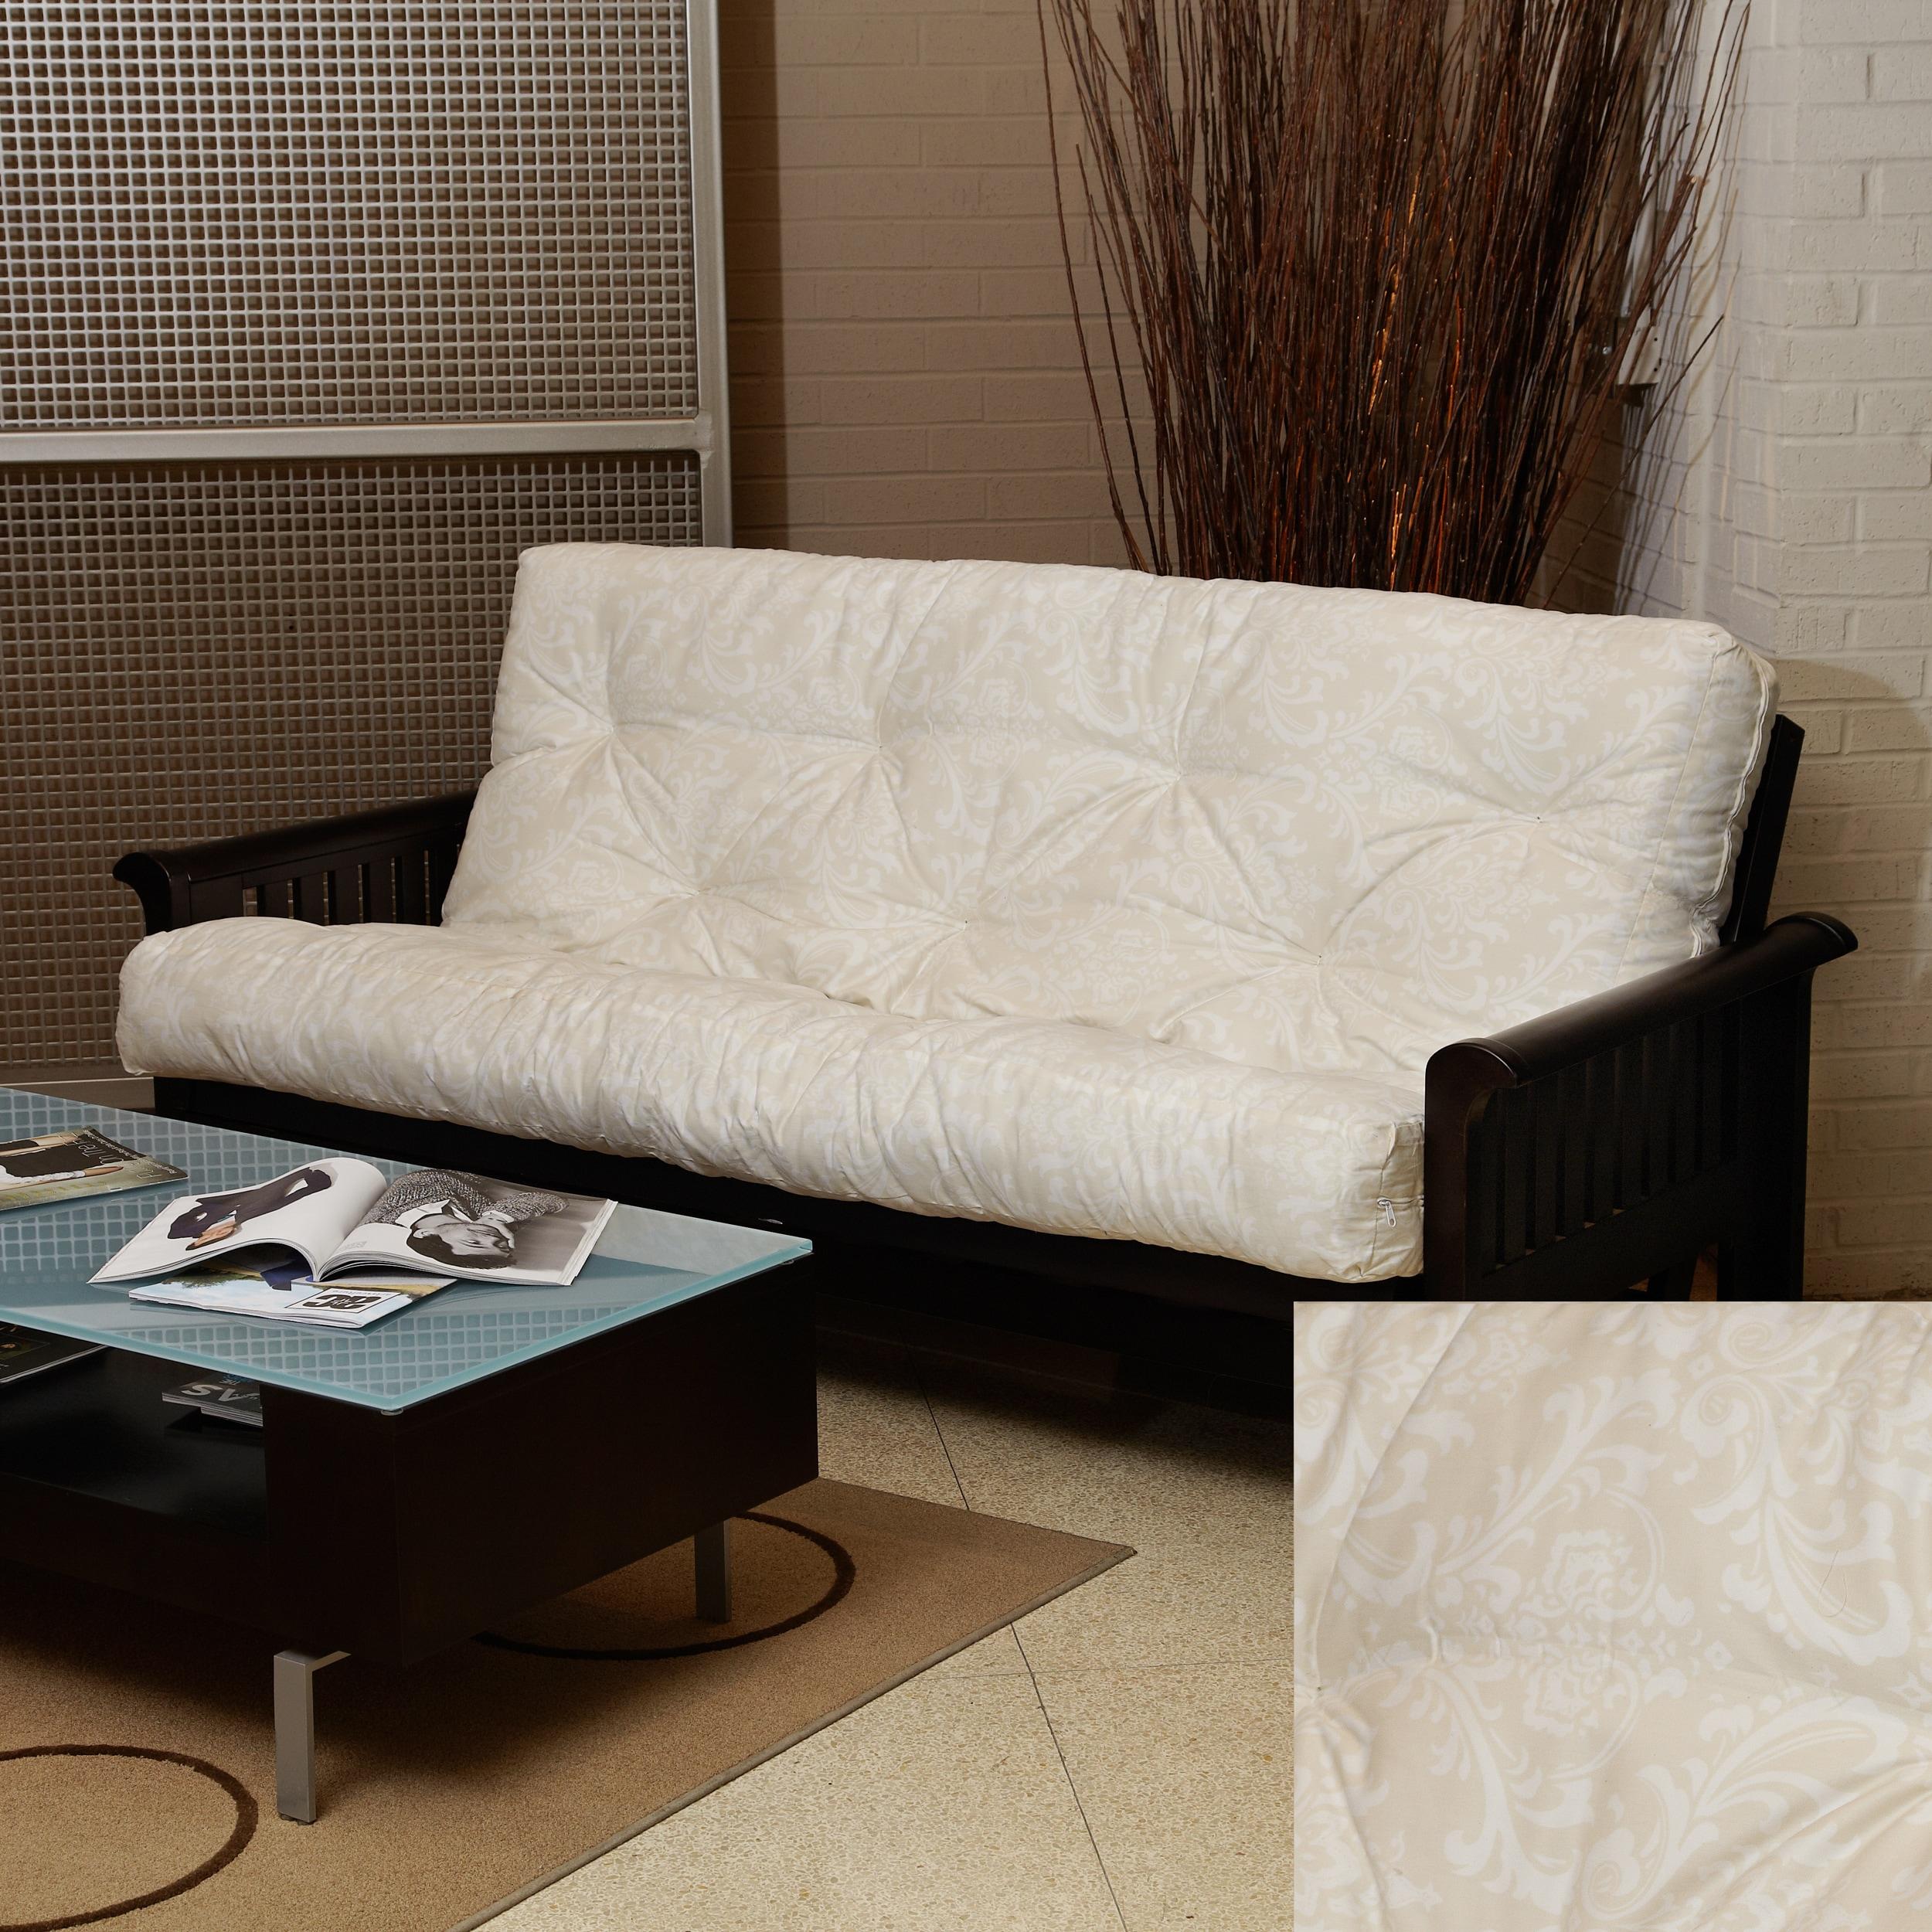 Beige Damask Full-Size 8-inch Dual Memory Foam Futon Mattress